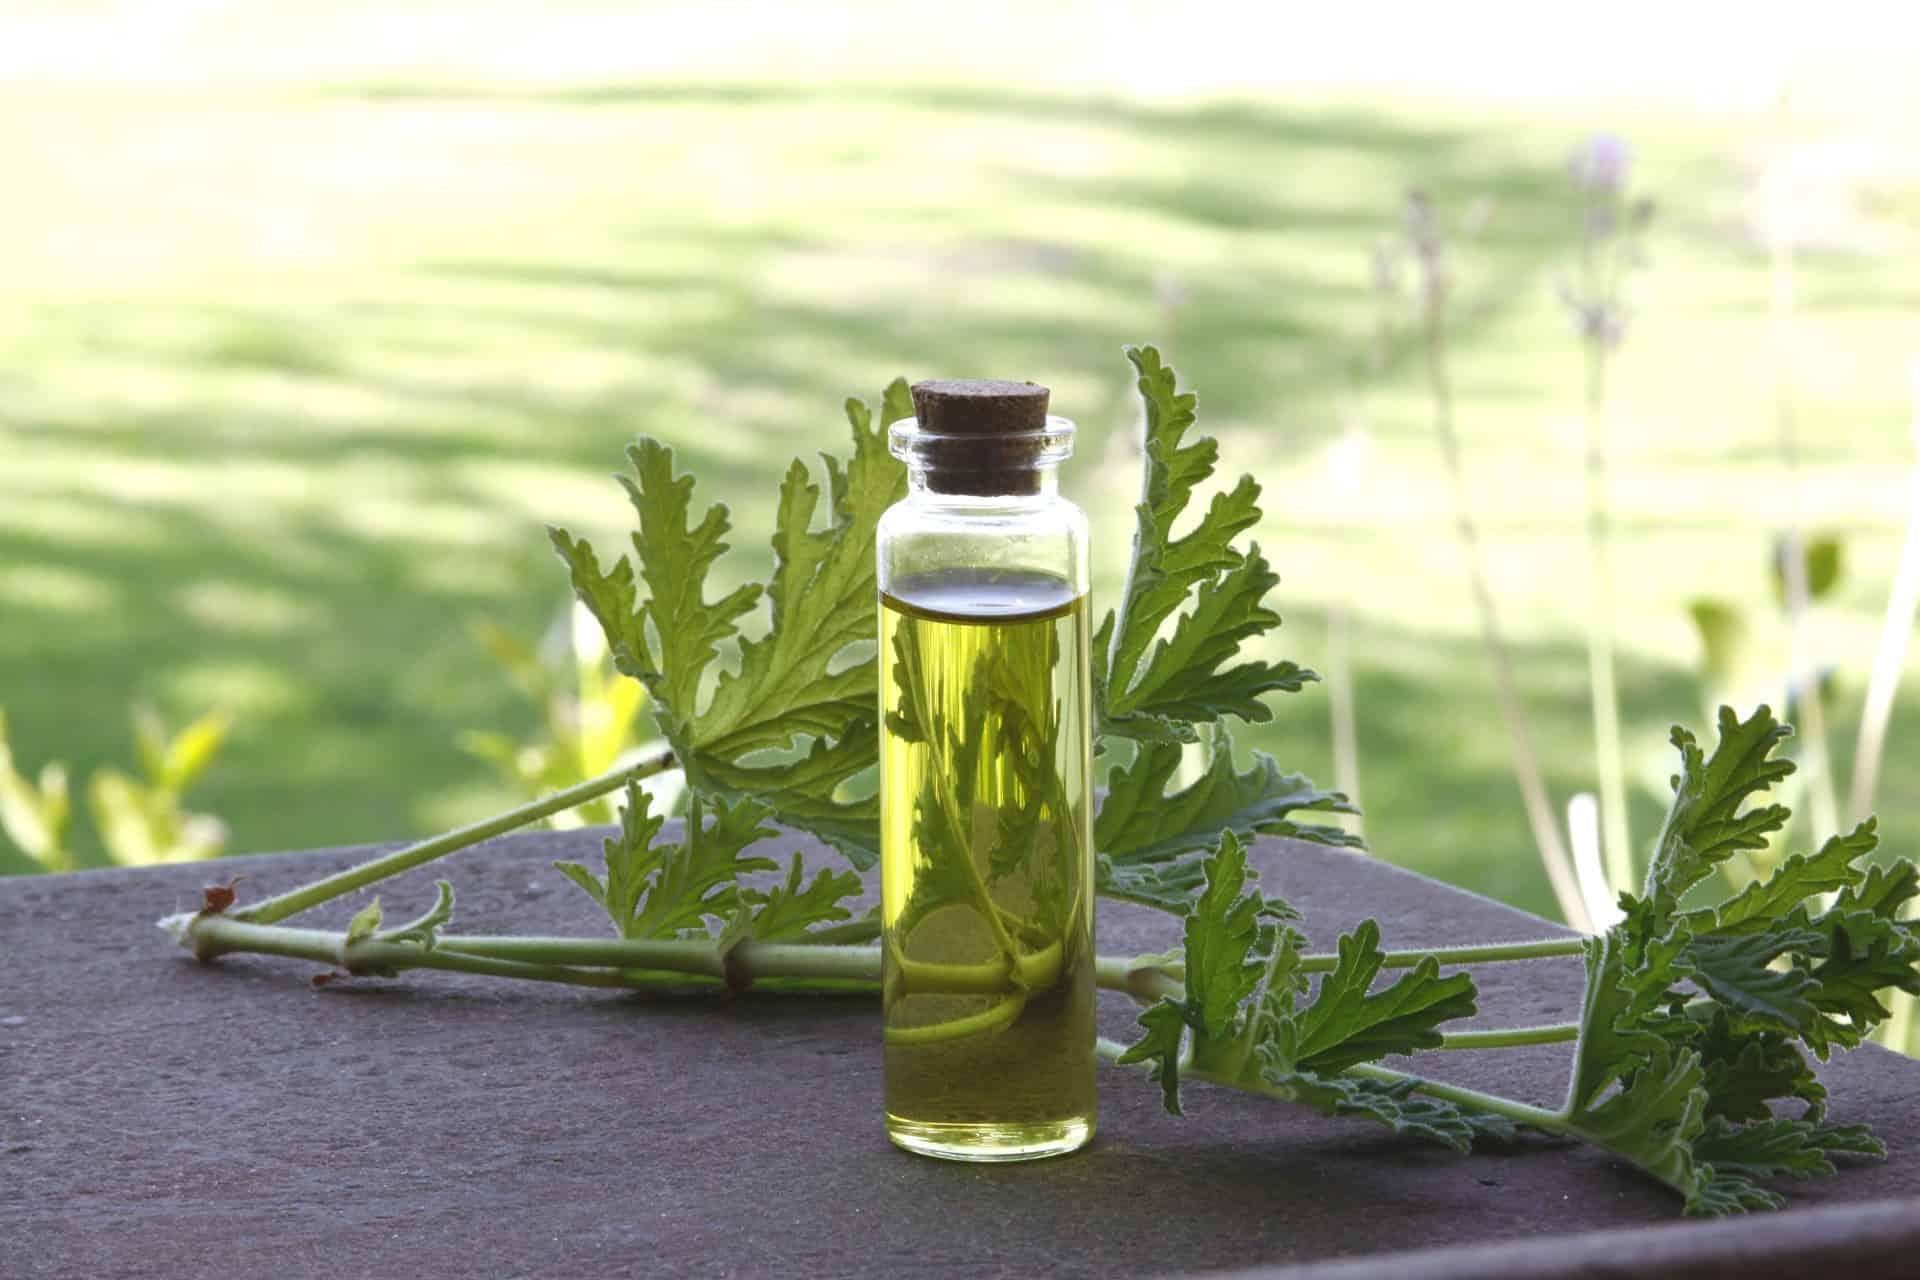 'Godfather' of North Coast olive oil goes international